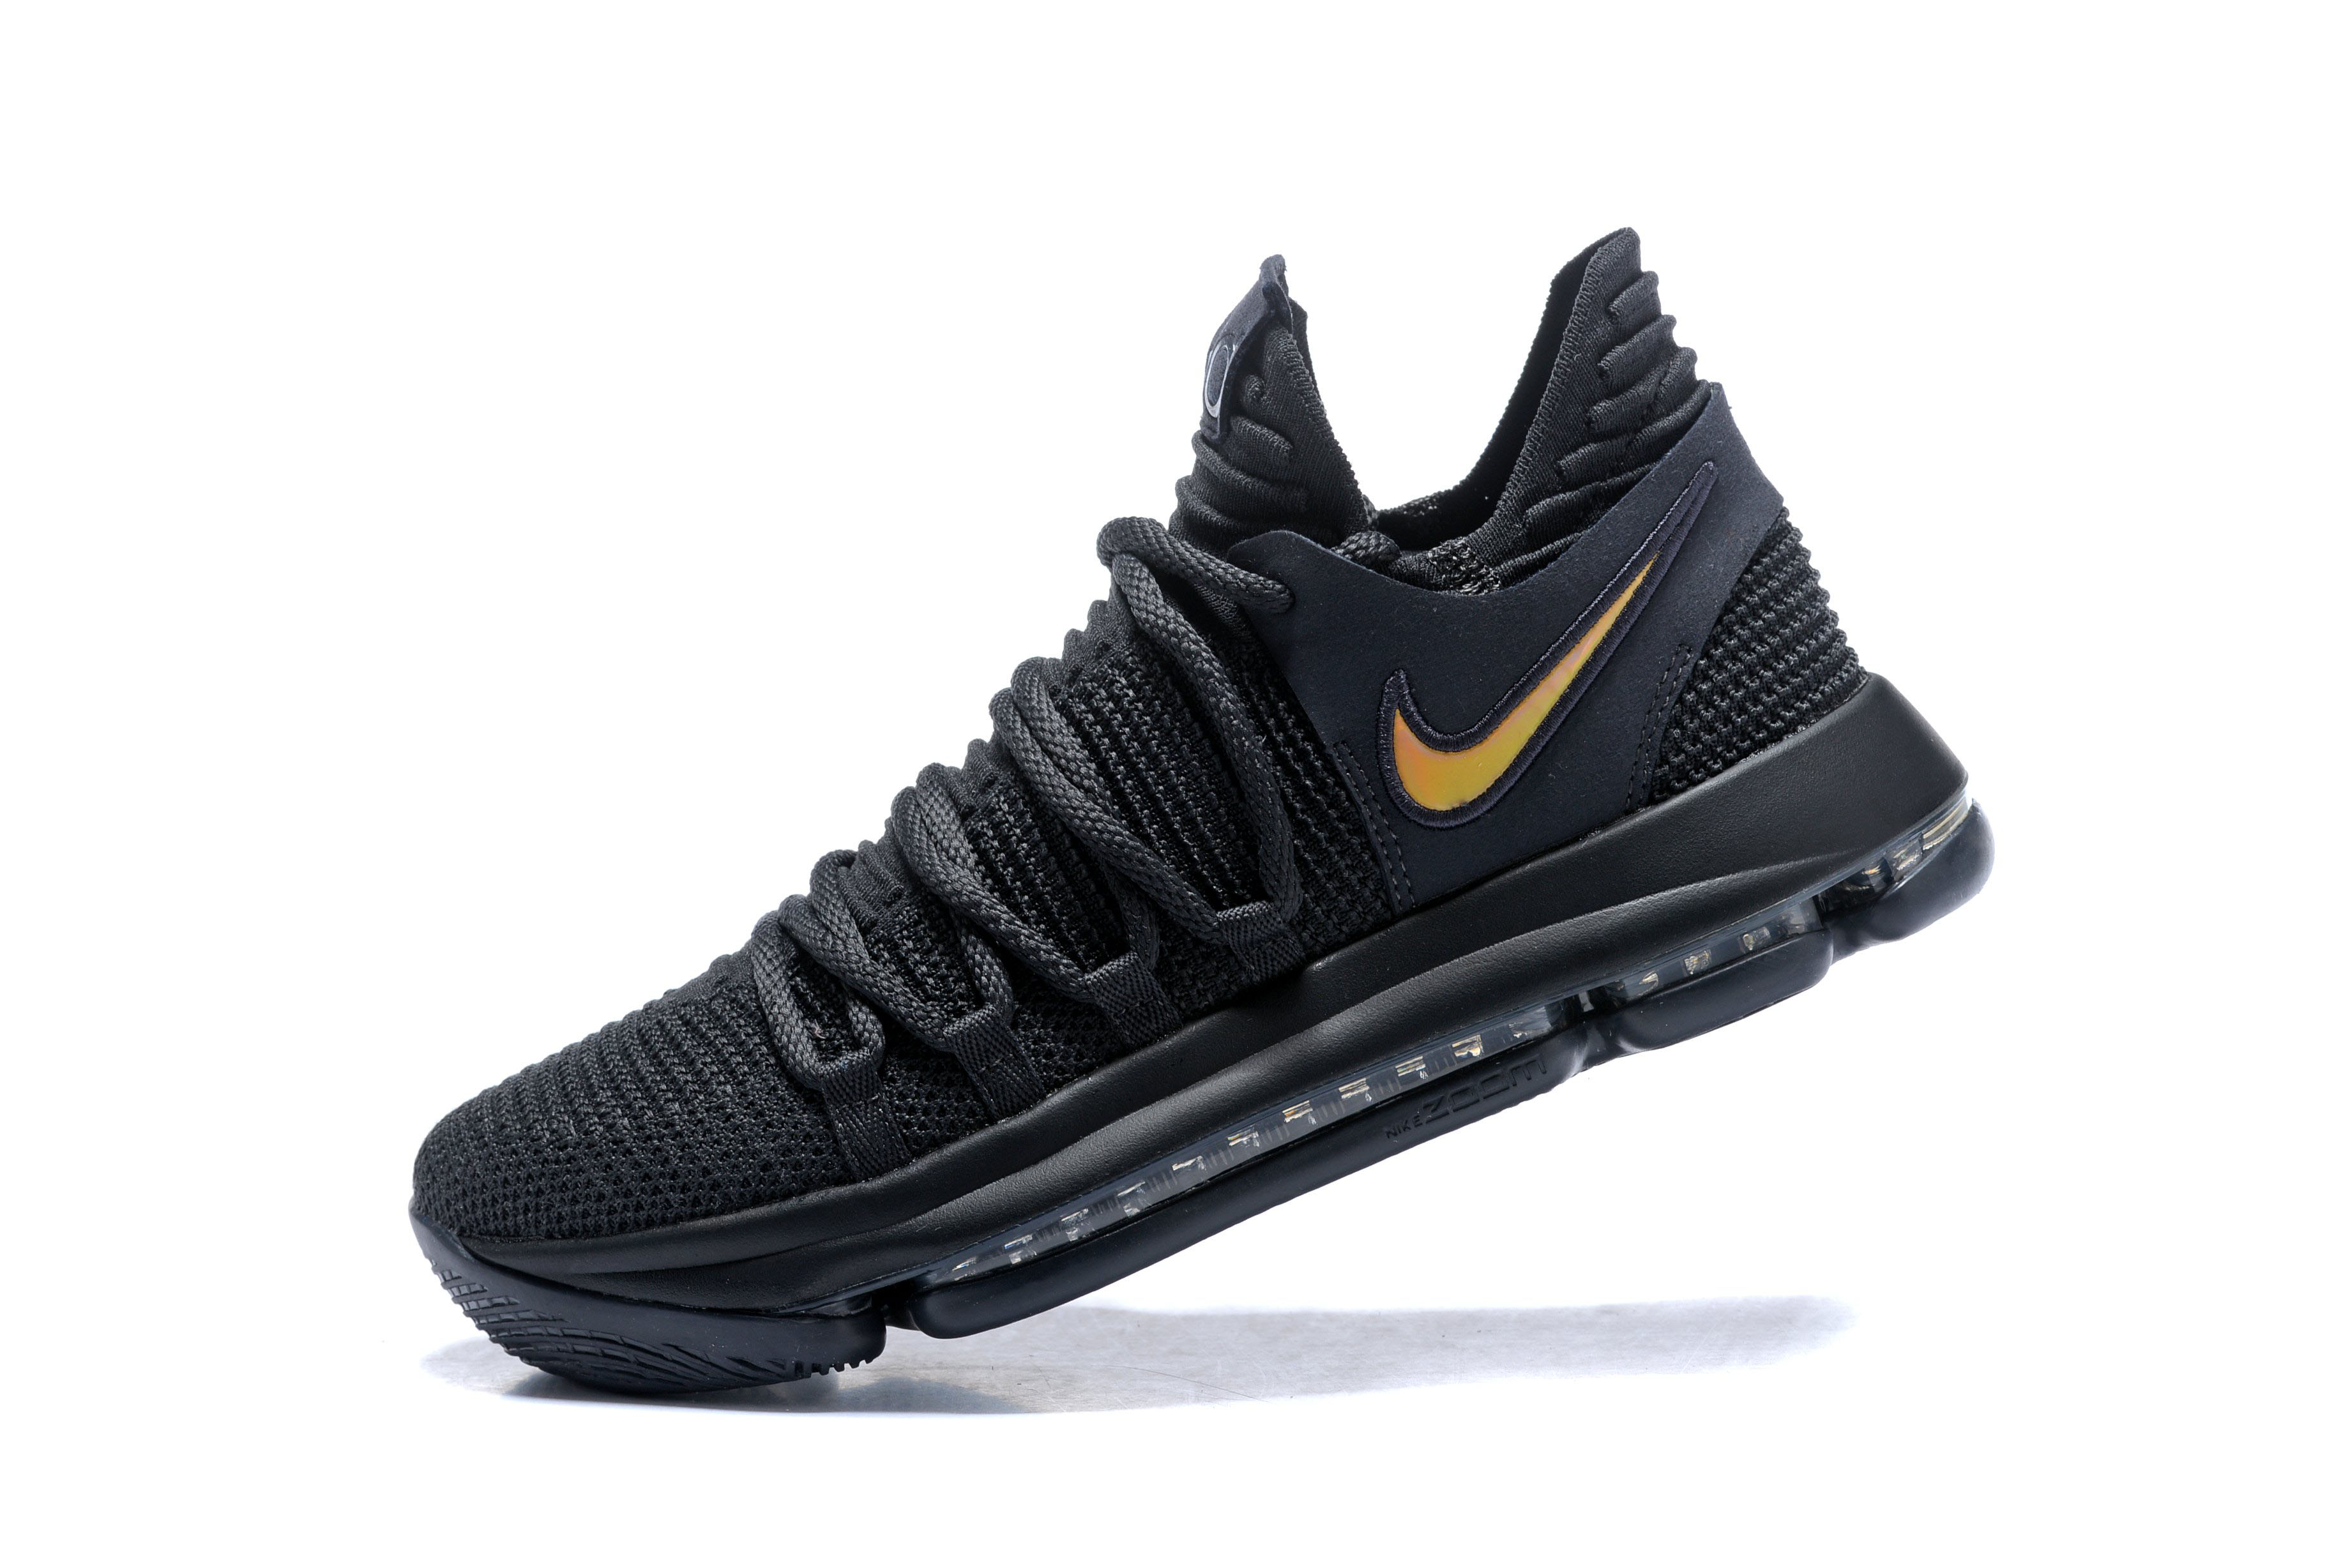 0e8d14405337 Nike KD 10 PK80 Black Metallic Gold Men s Basketball Shoes